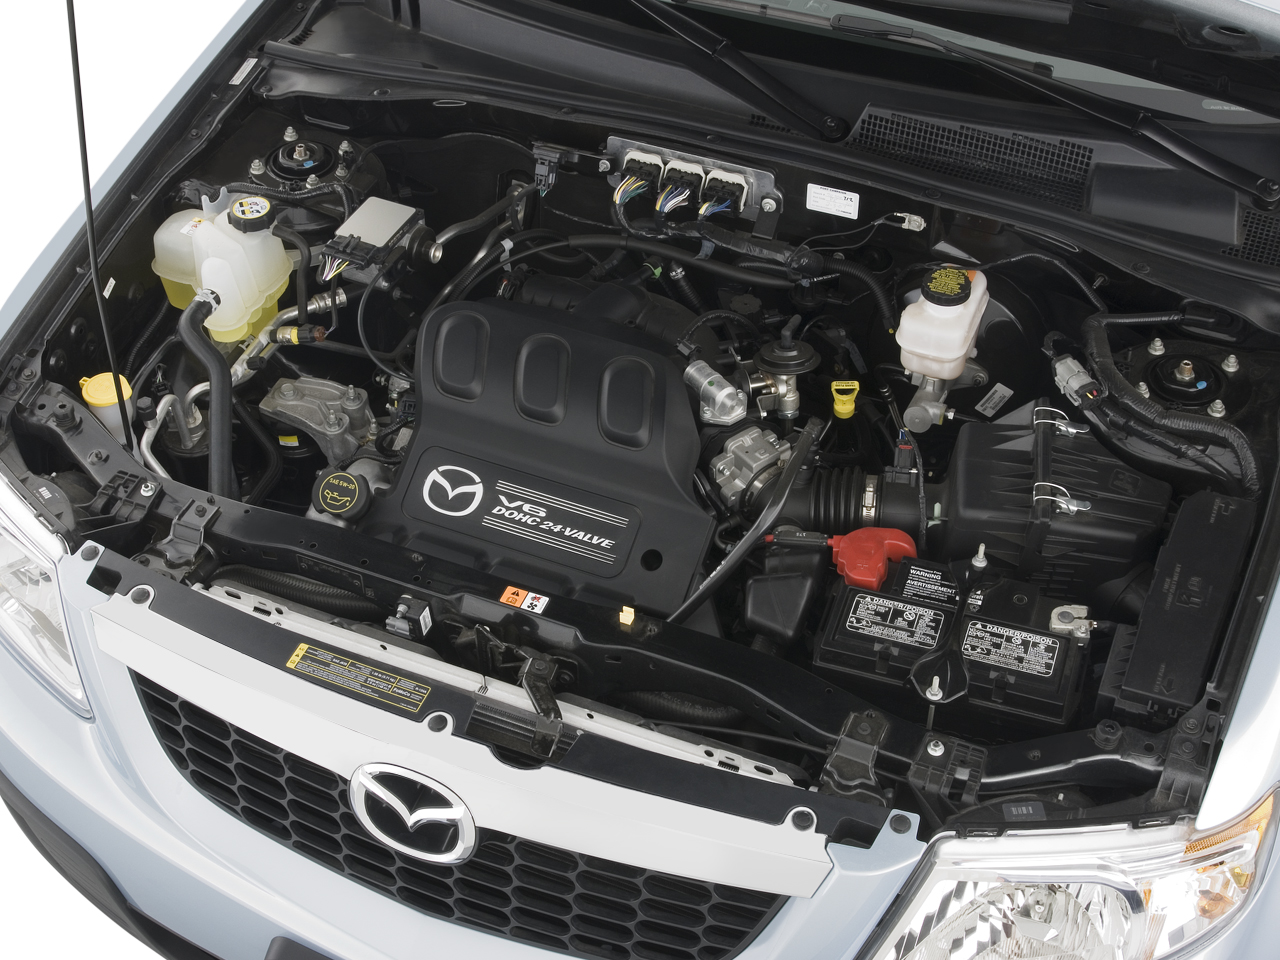 2008 Mazda Tribute Hybrid Latest News, Auto Show Coverage, And